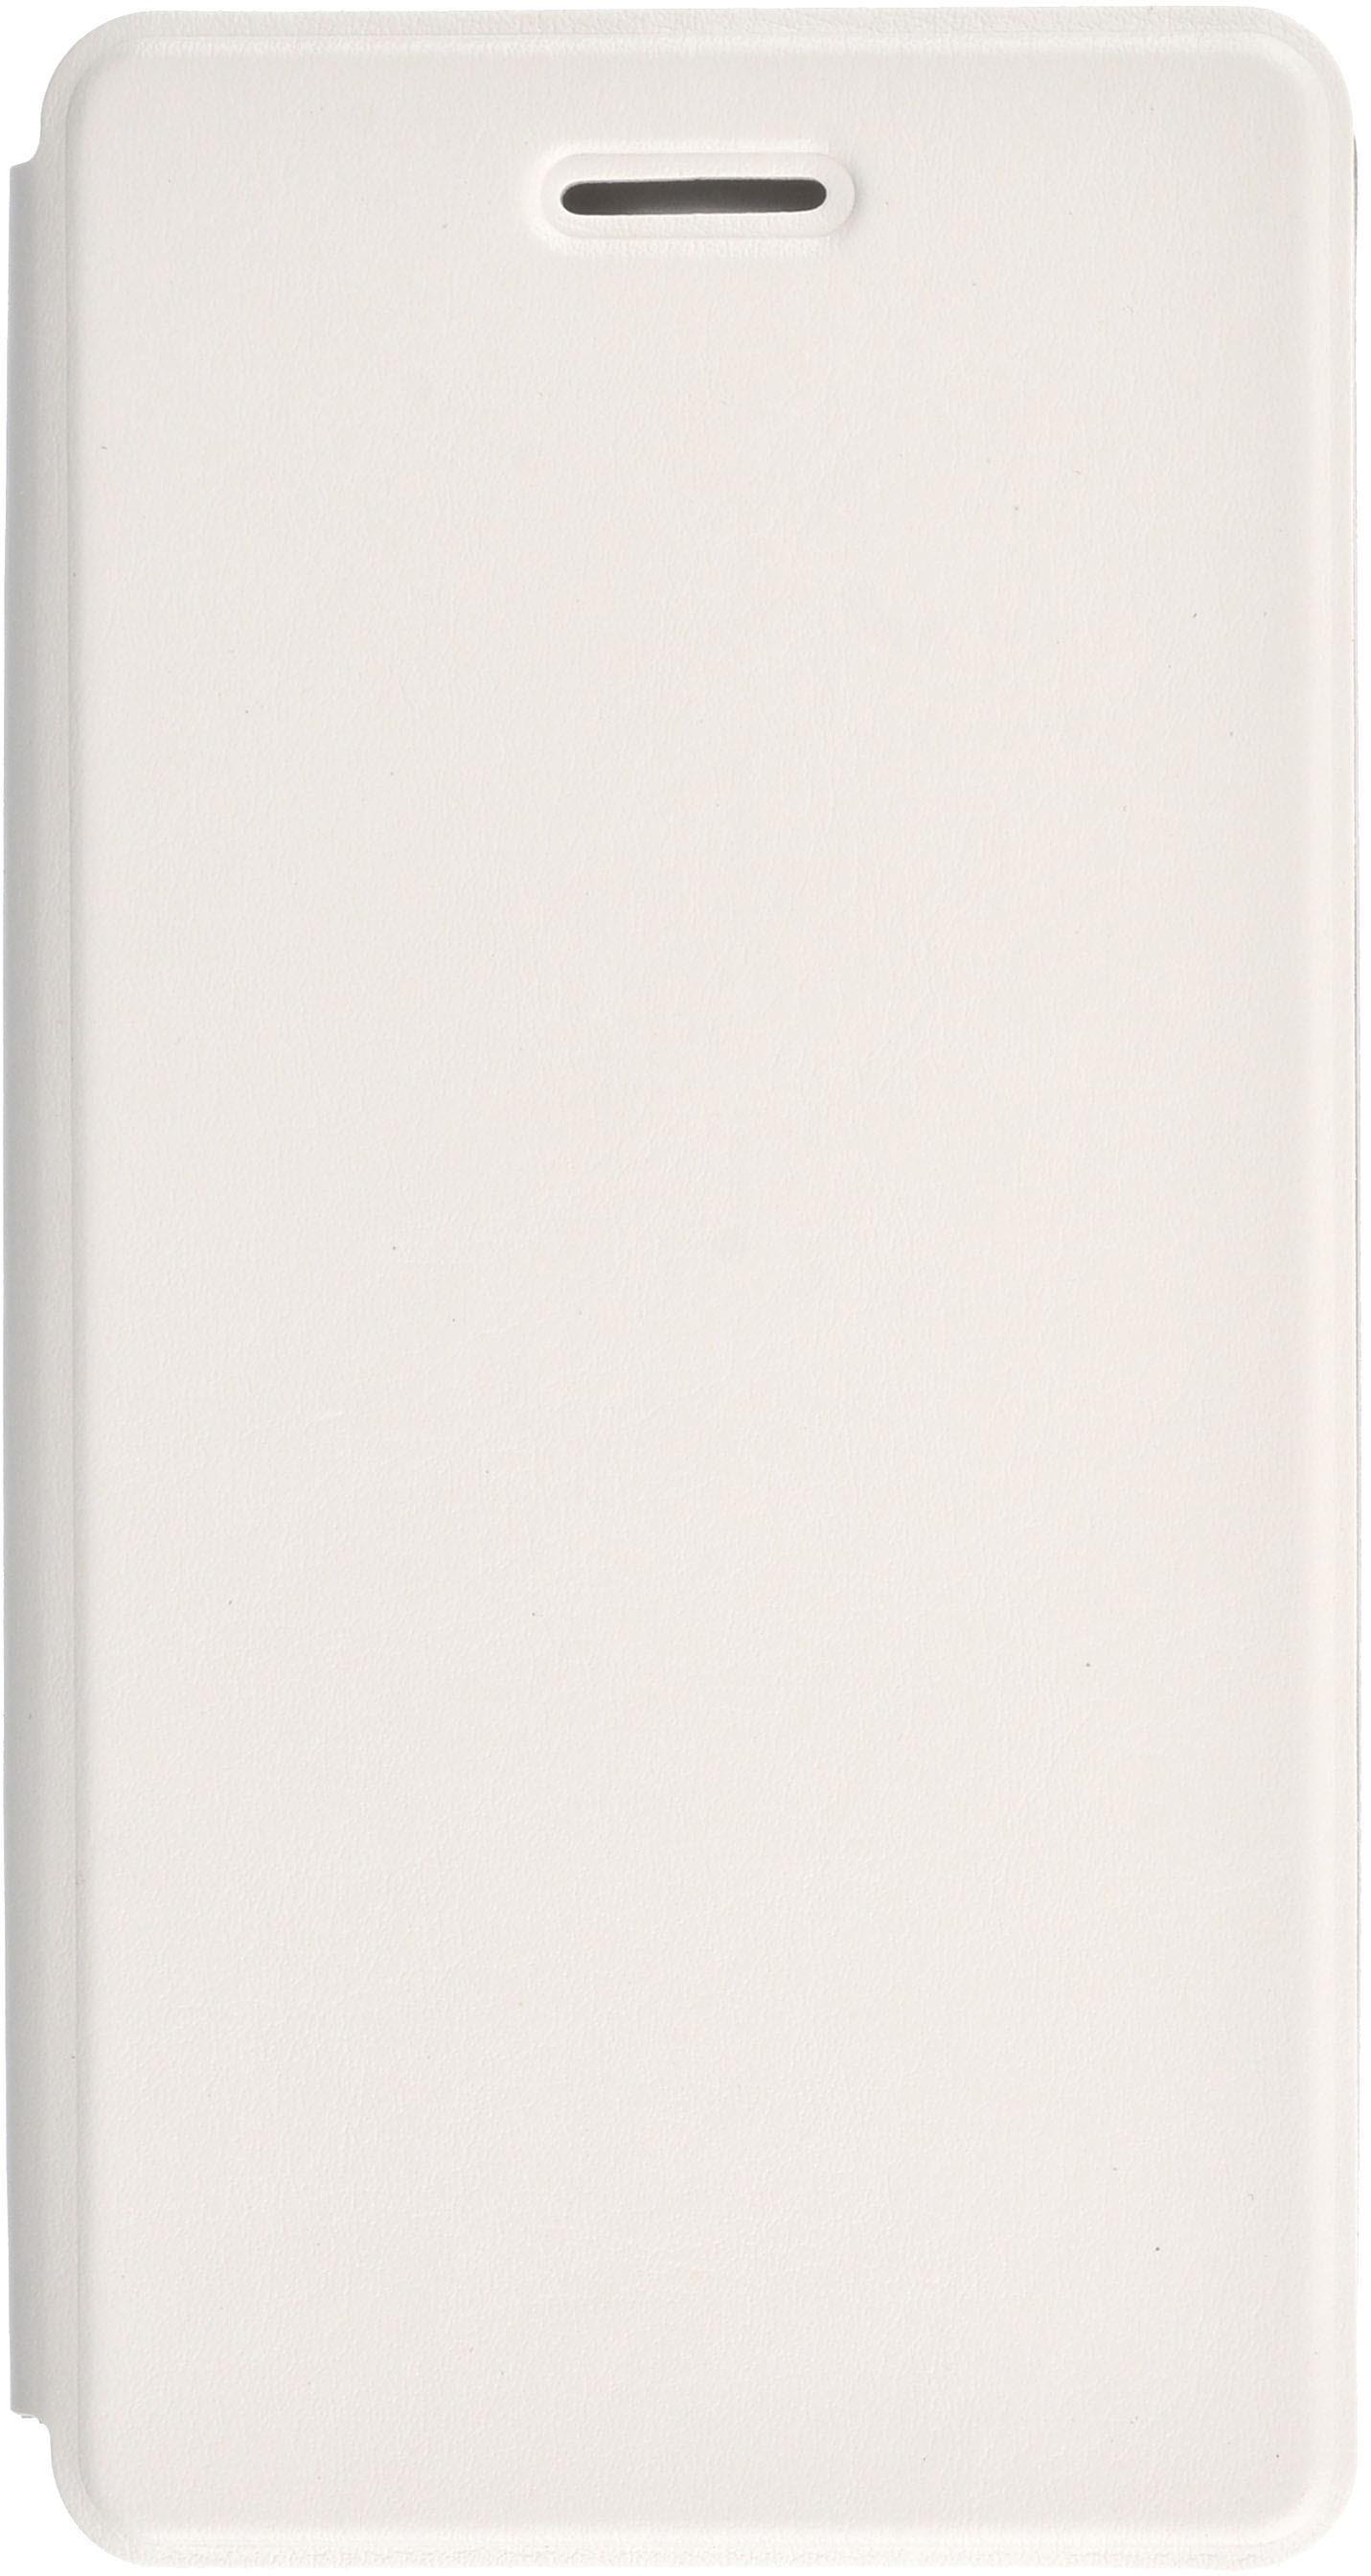 Чехол skinBOX для LG Class, 2000000084374, белый чехол защитный skinbox lg magna